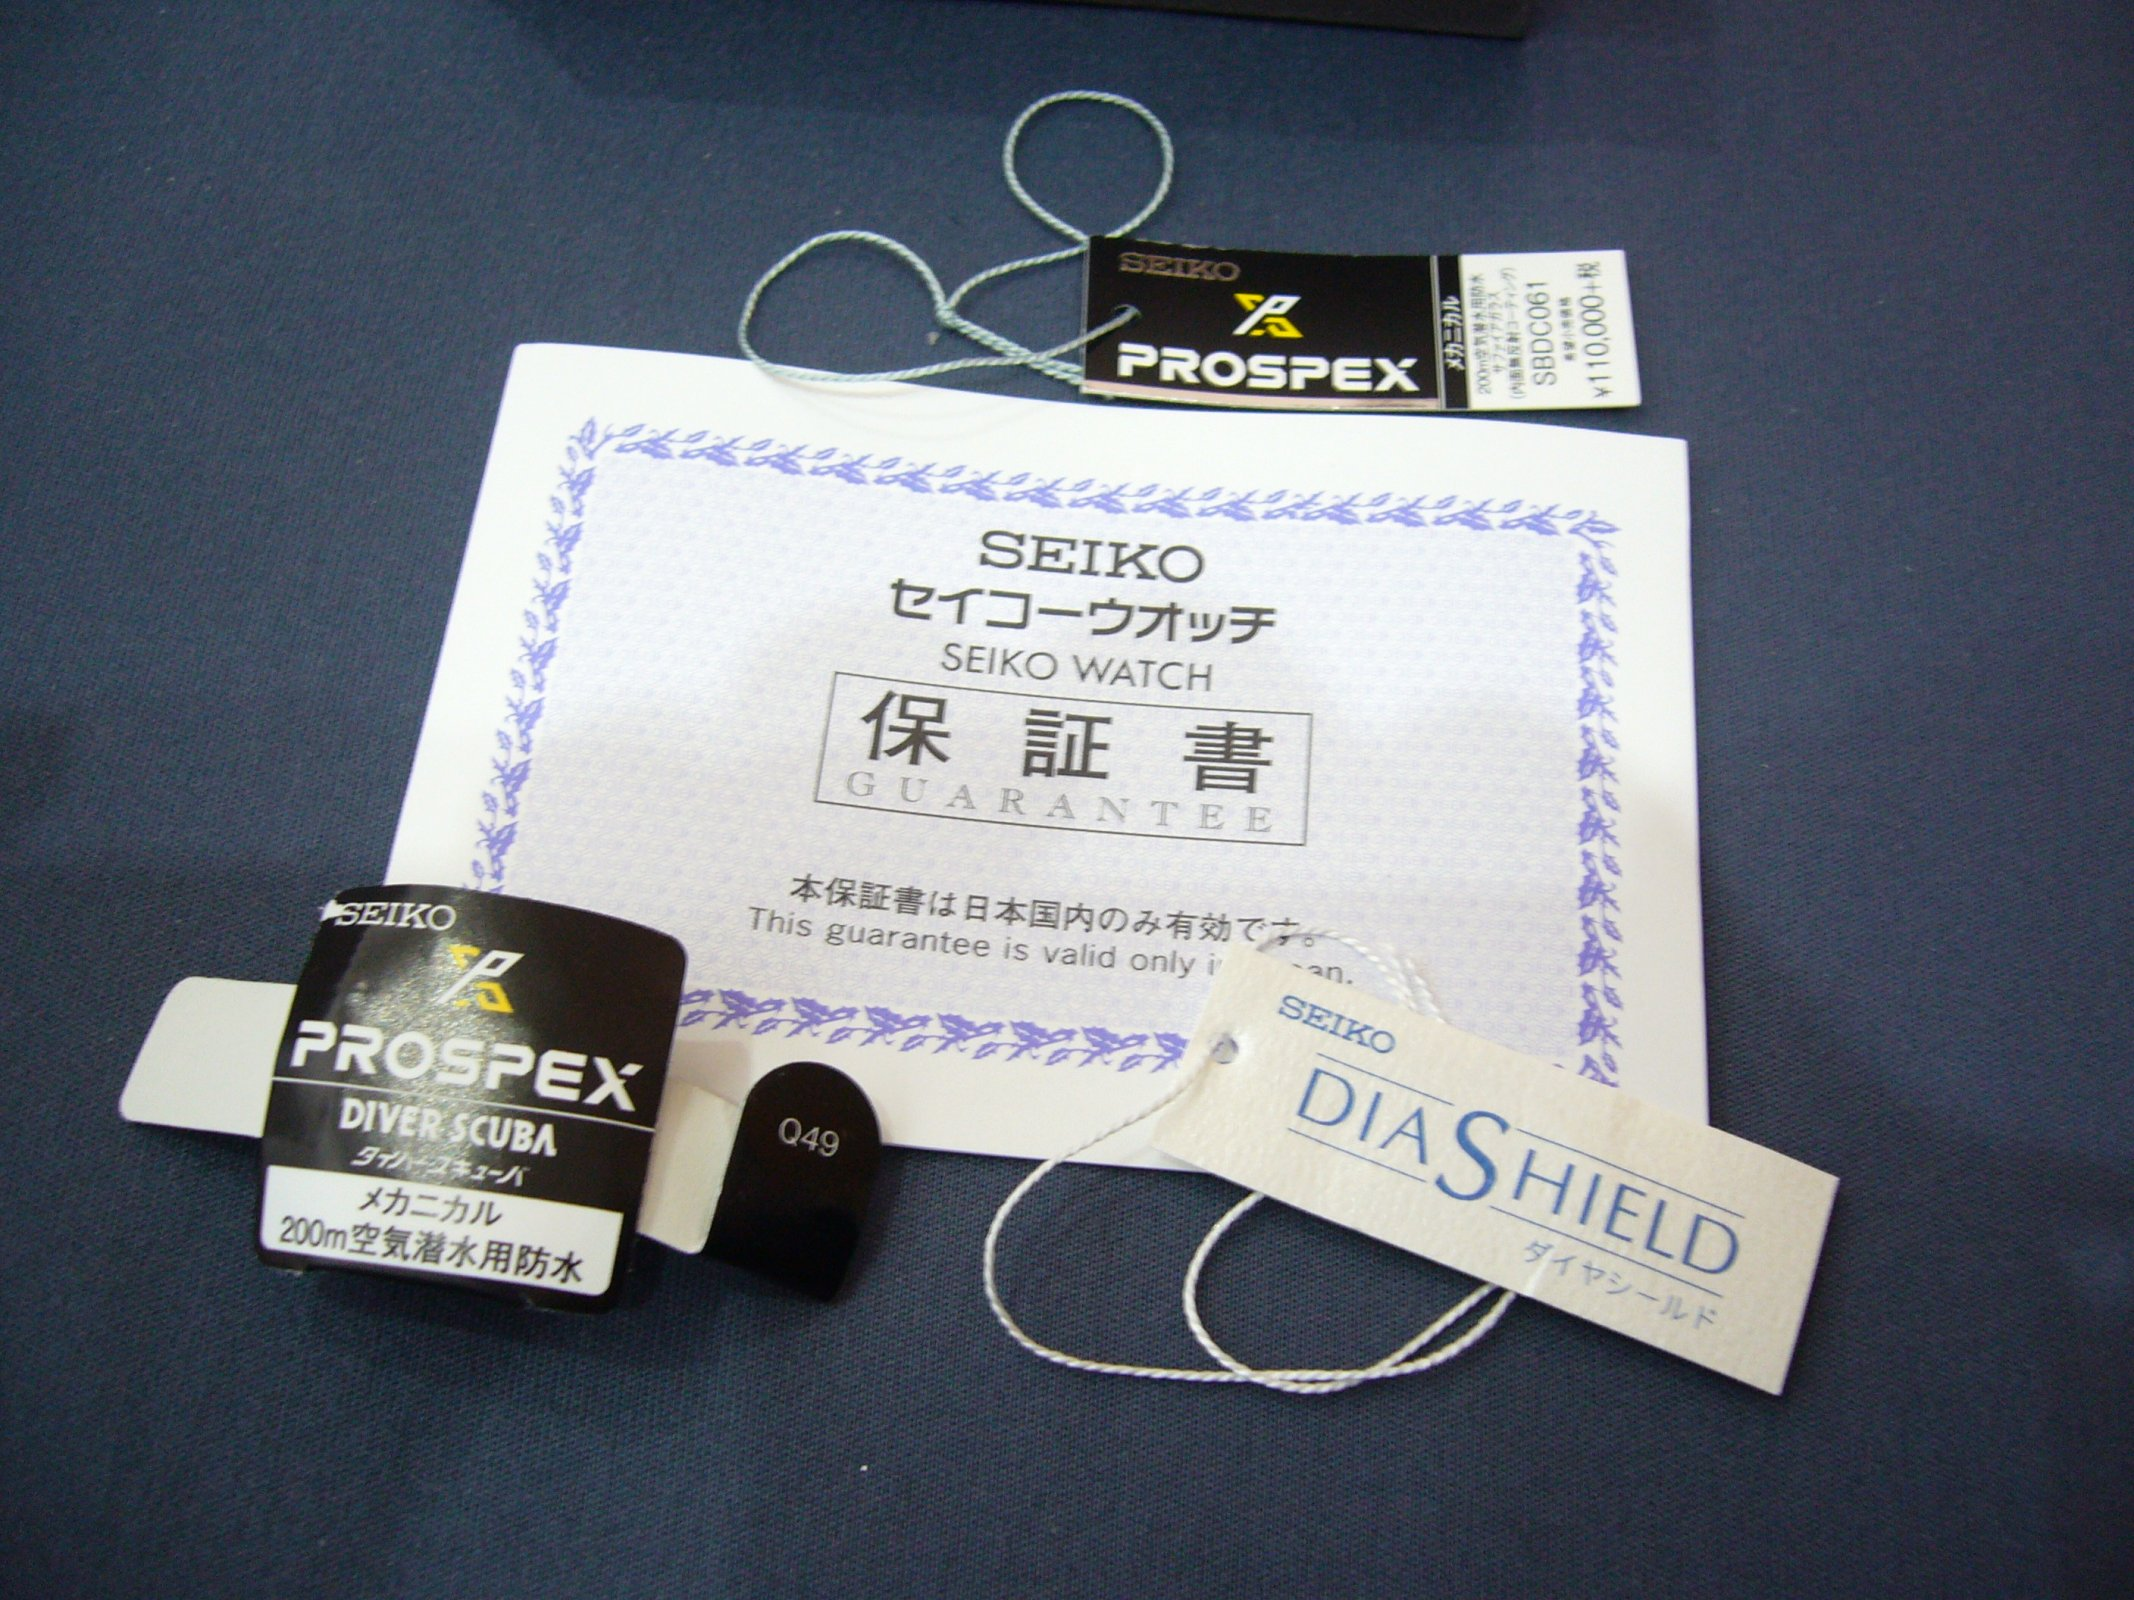 P1170016.JPG